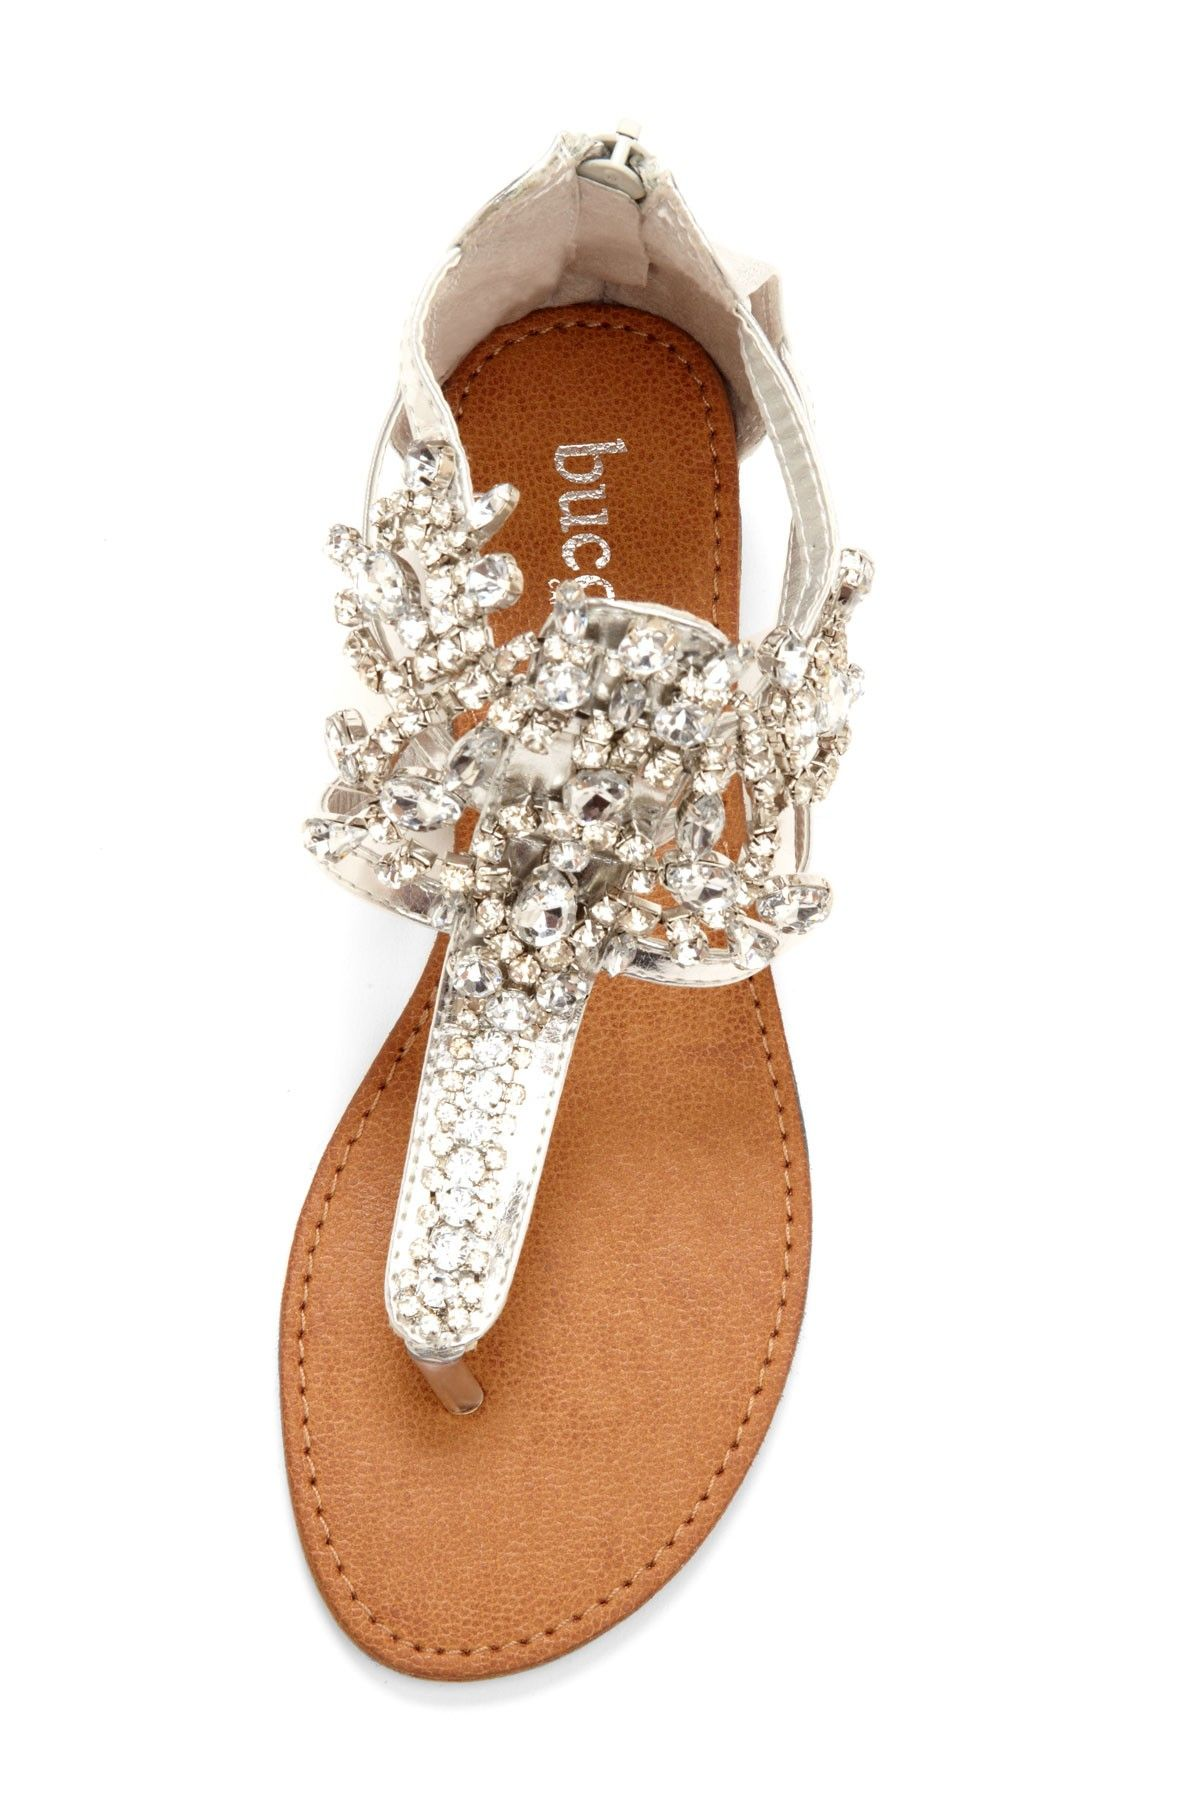 Bucco Destiny Rhinestone Sandal